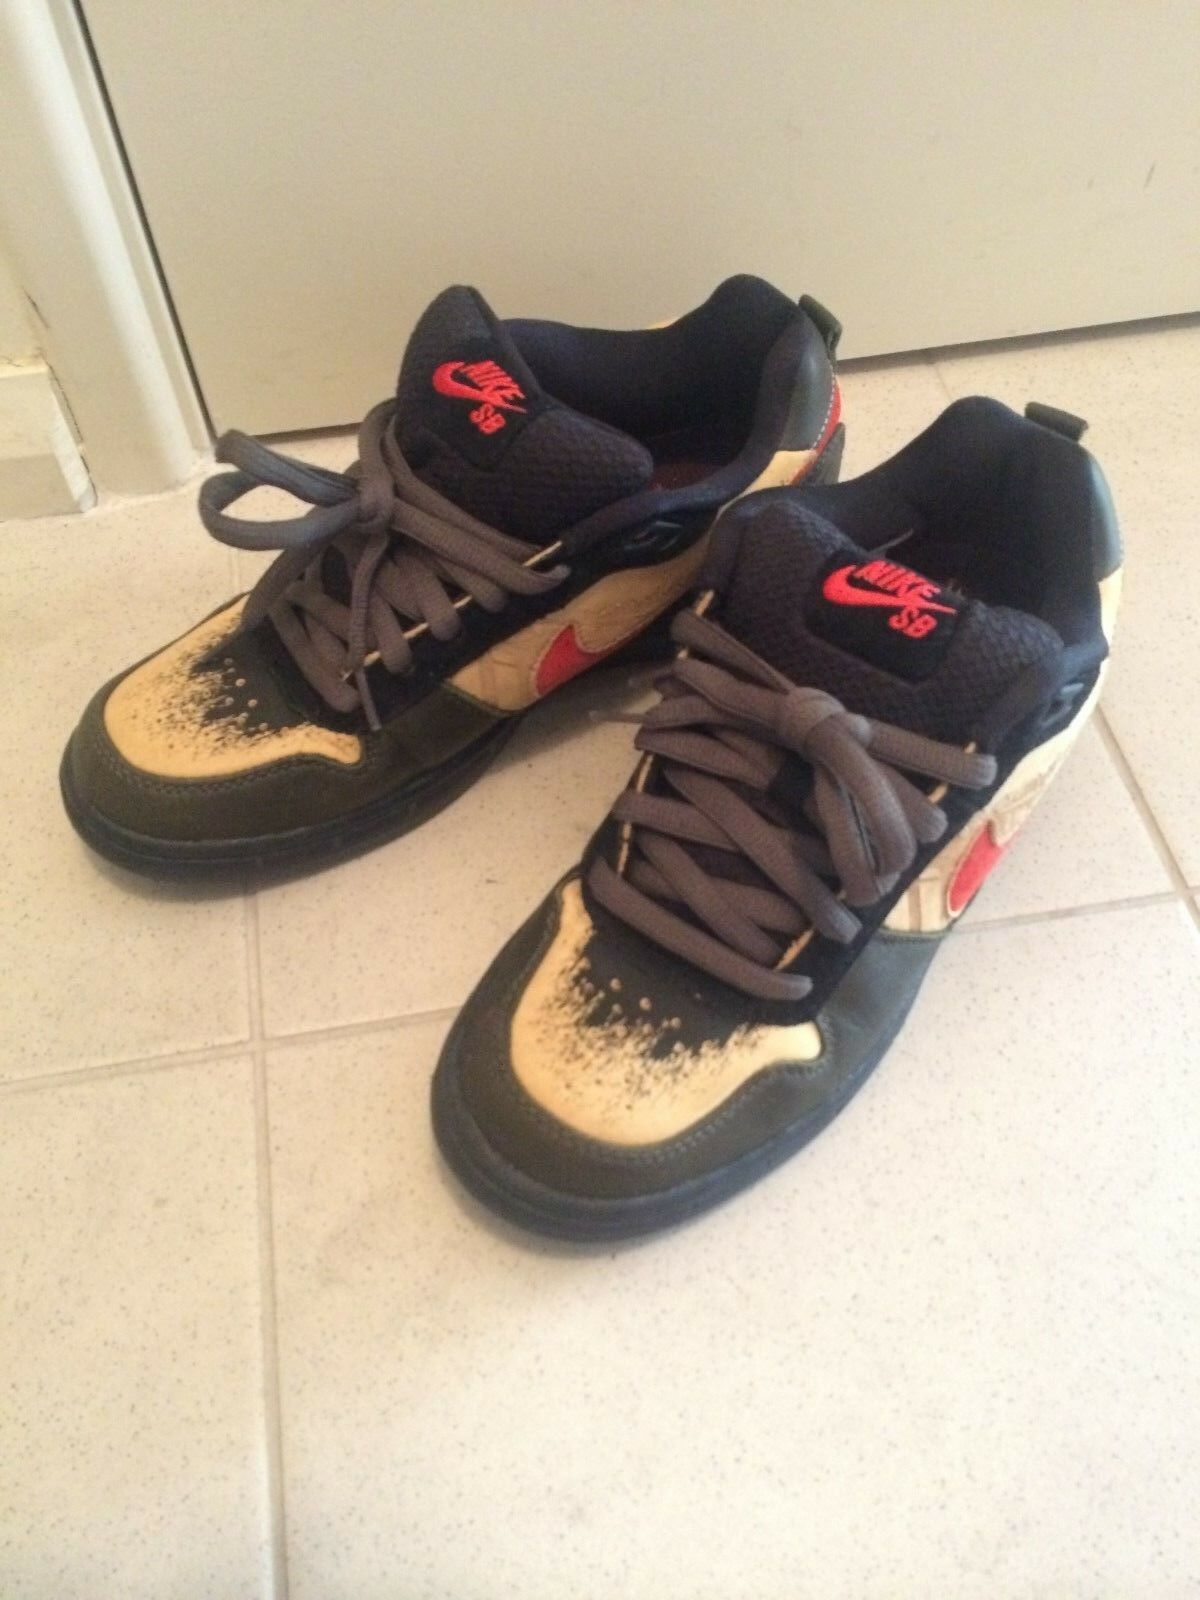 Nike Zoom Air Elite P ROD x STASH SB Sneakers